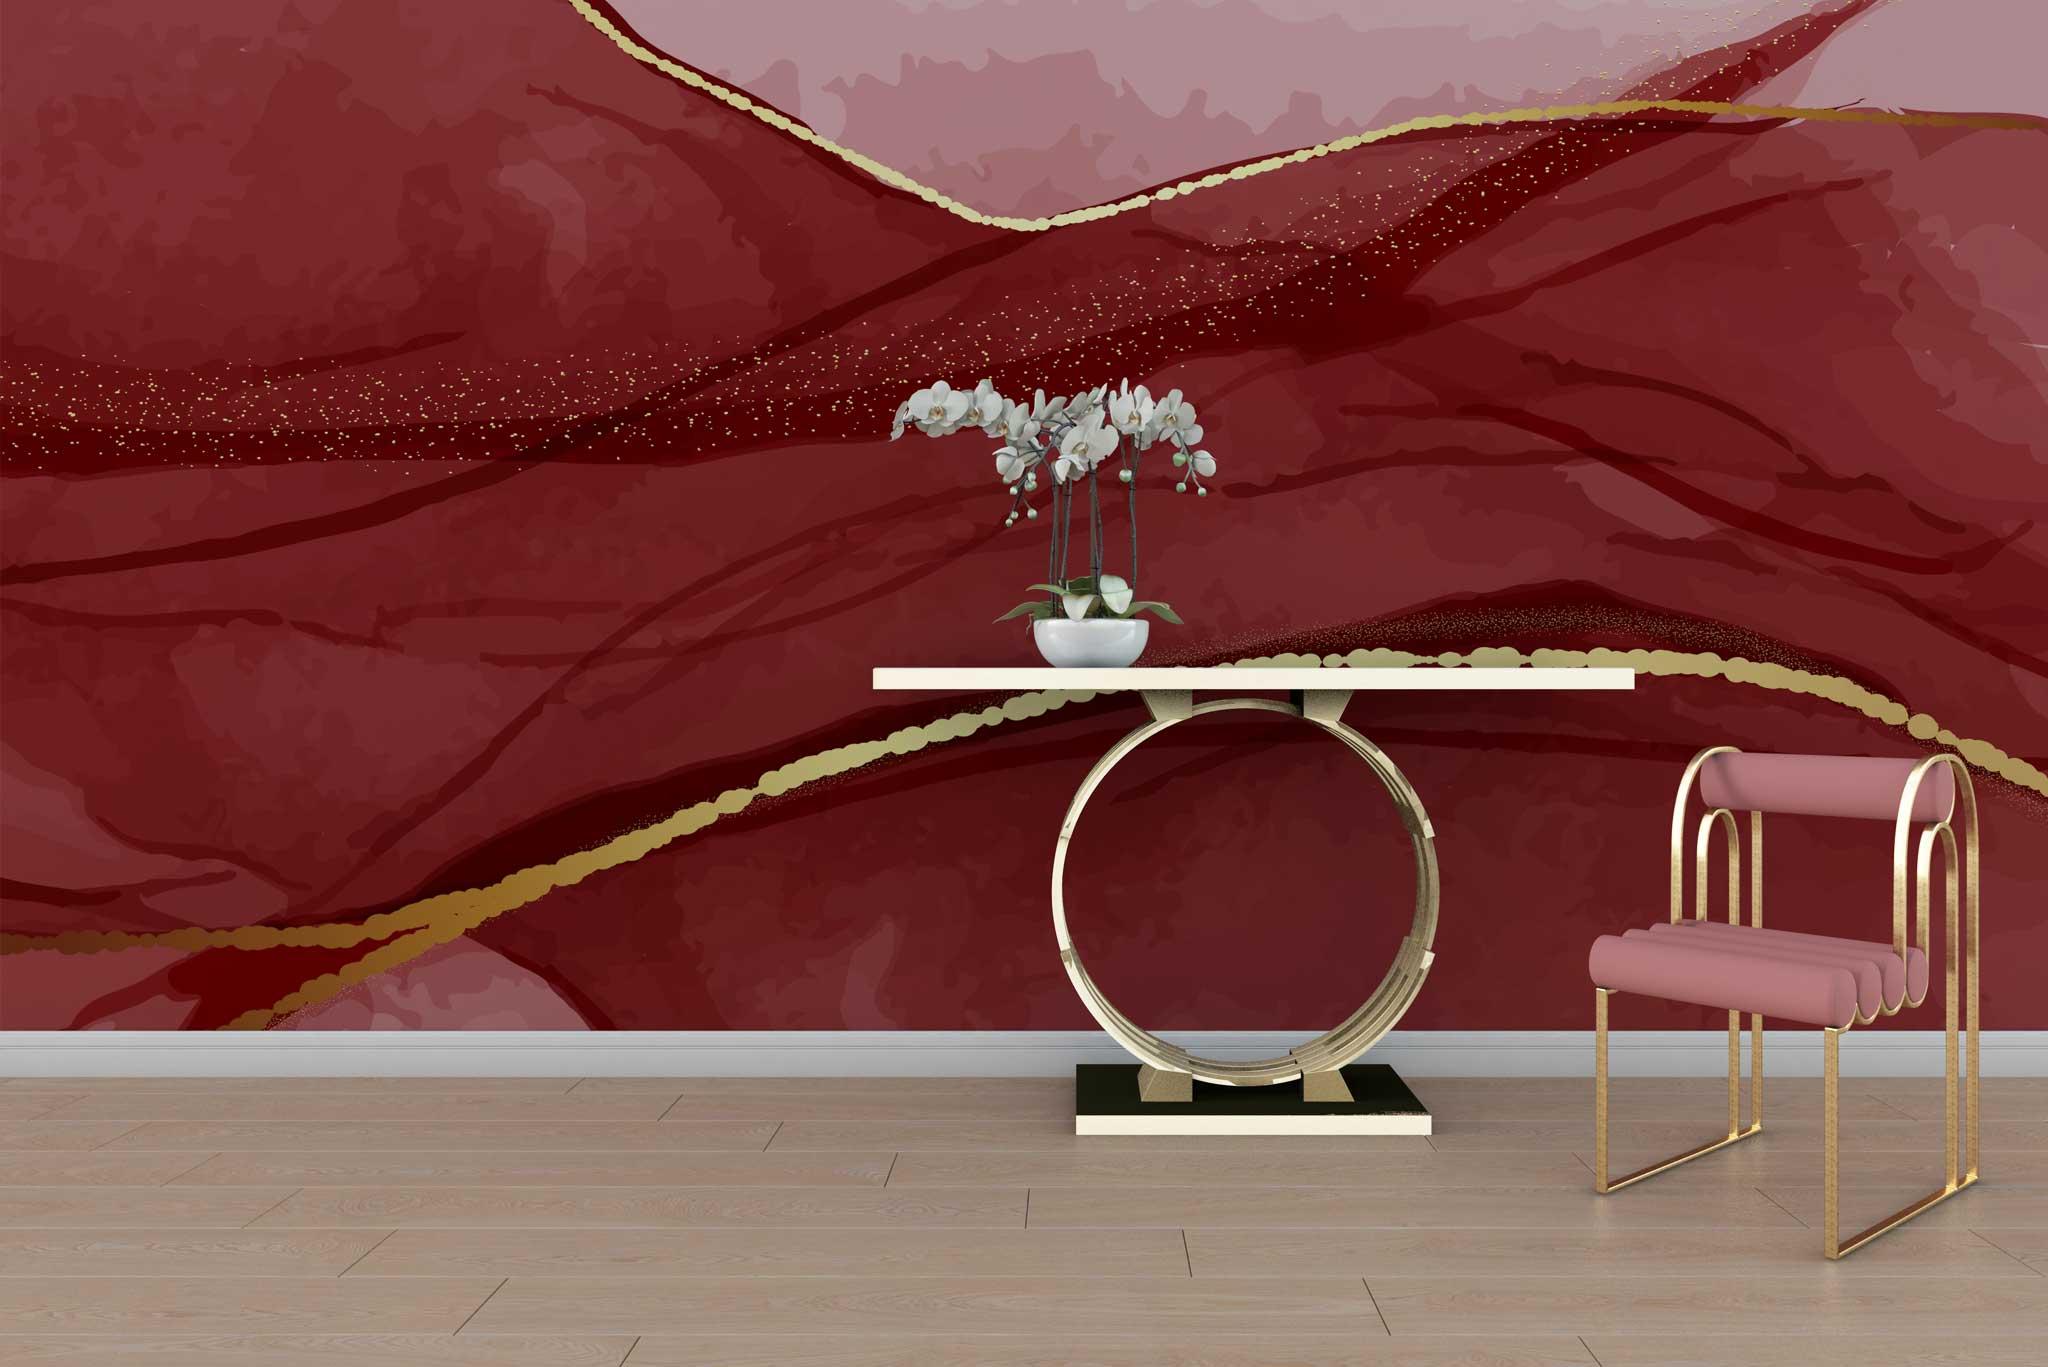 tapet-fototapet-special-personalizat-customizabil-comanda-bucuresti-daring-prints-model-contemporan-elegant-lux-ilustratie-acuarela-rosu-auriu